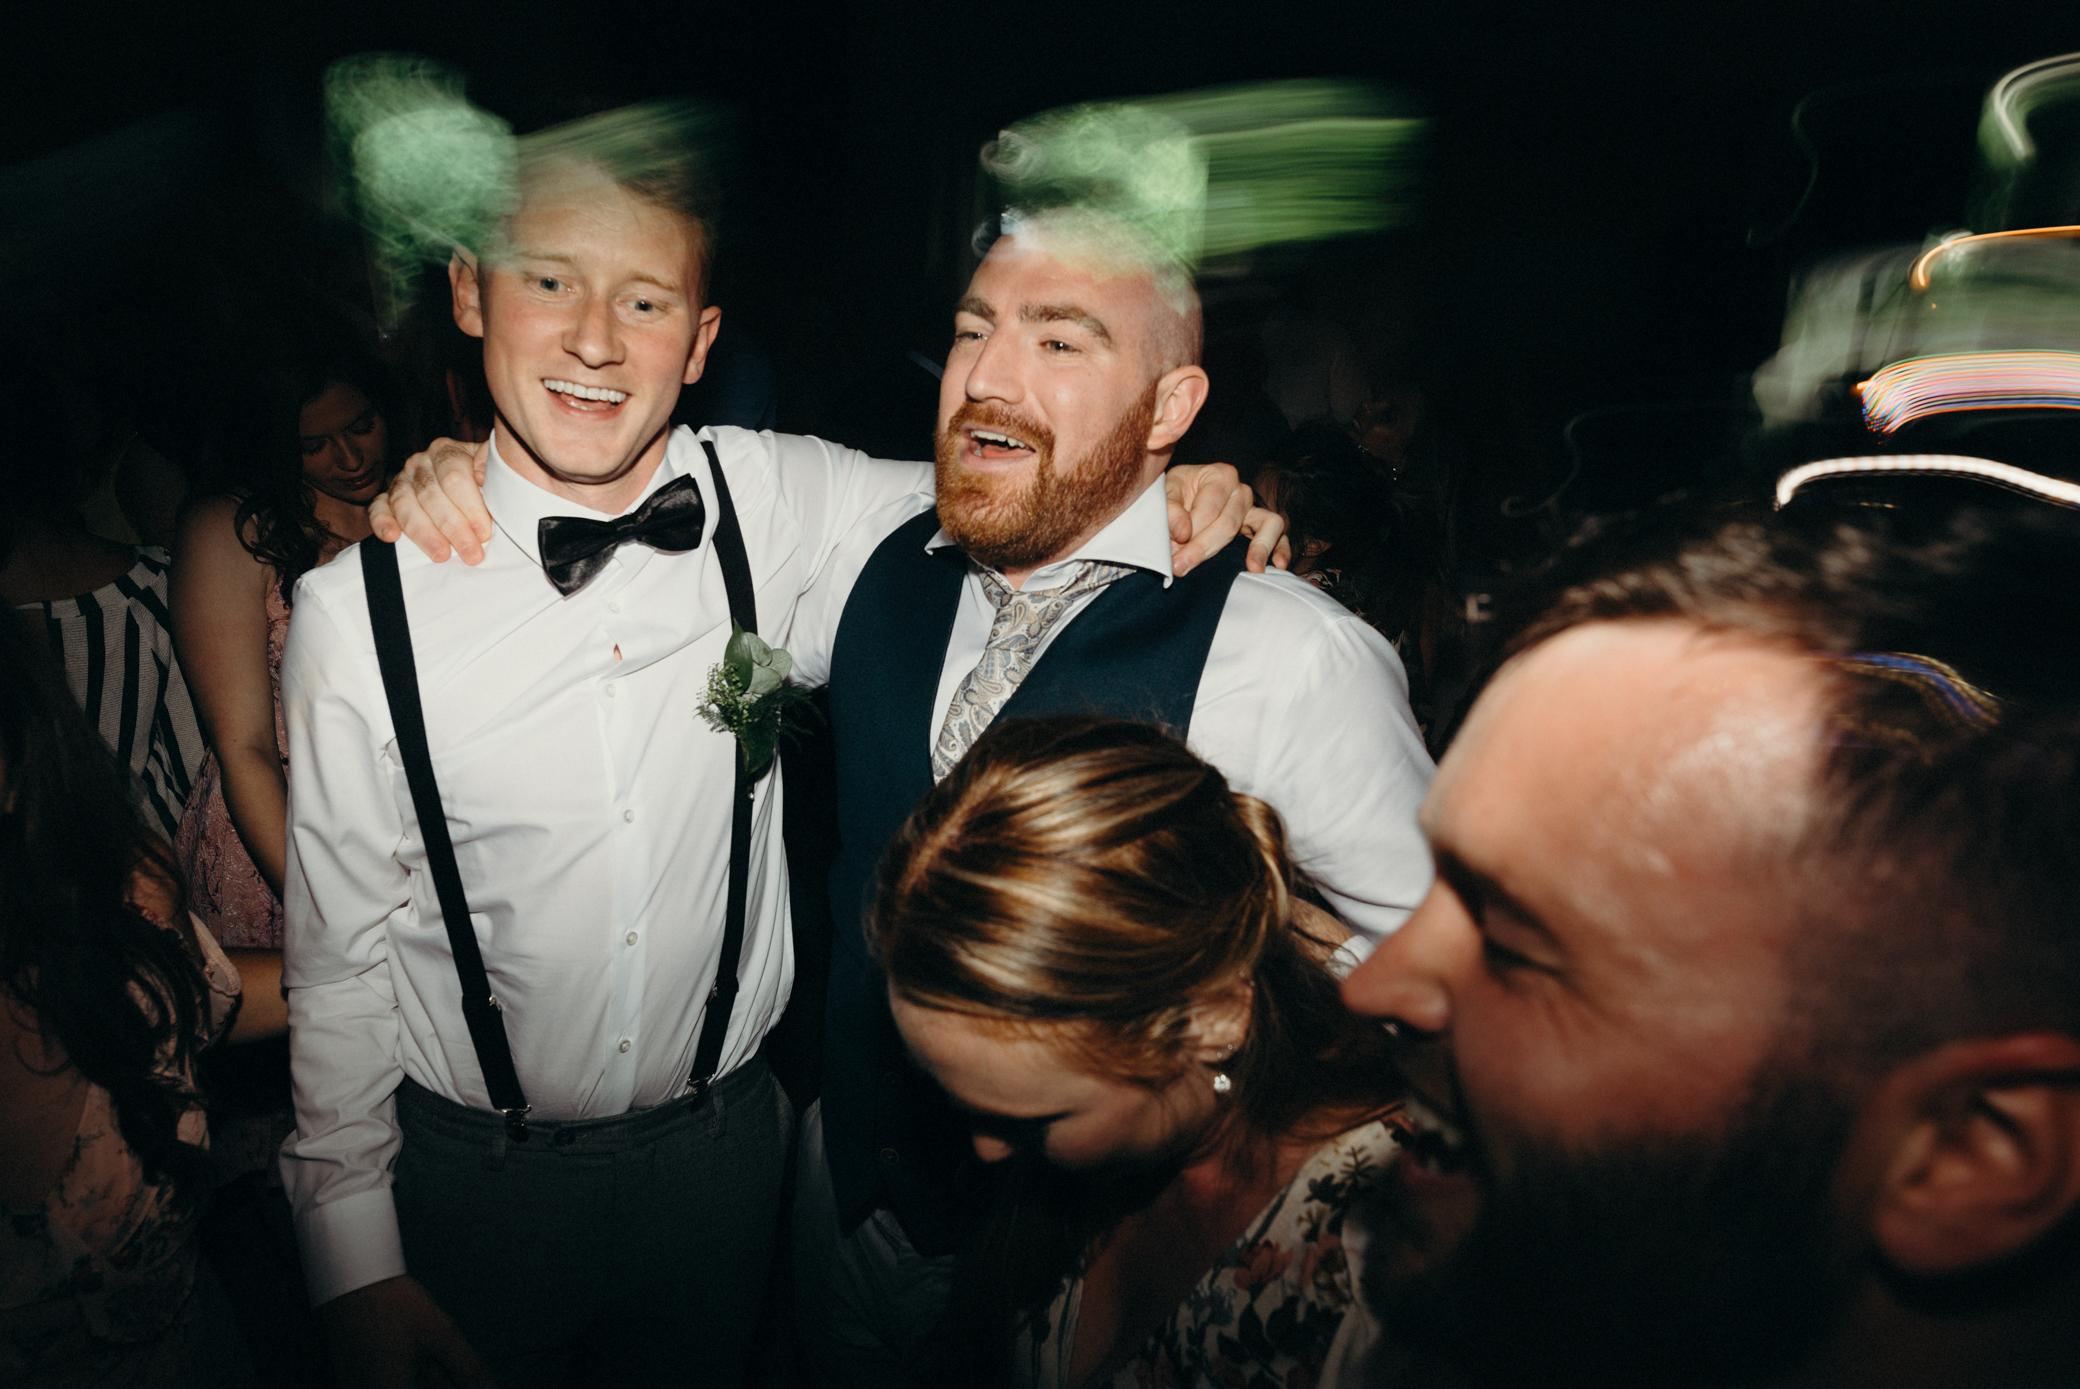 Alan&Naz- Barberstown Castle Wedding - Wedding photographer Ireland-223.jpg